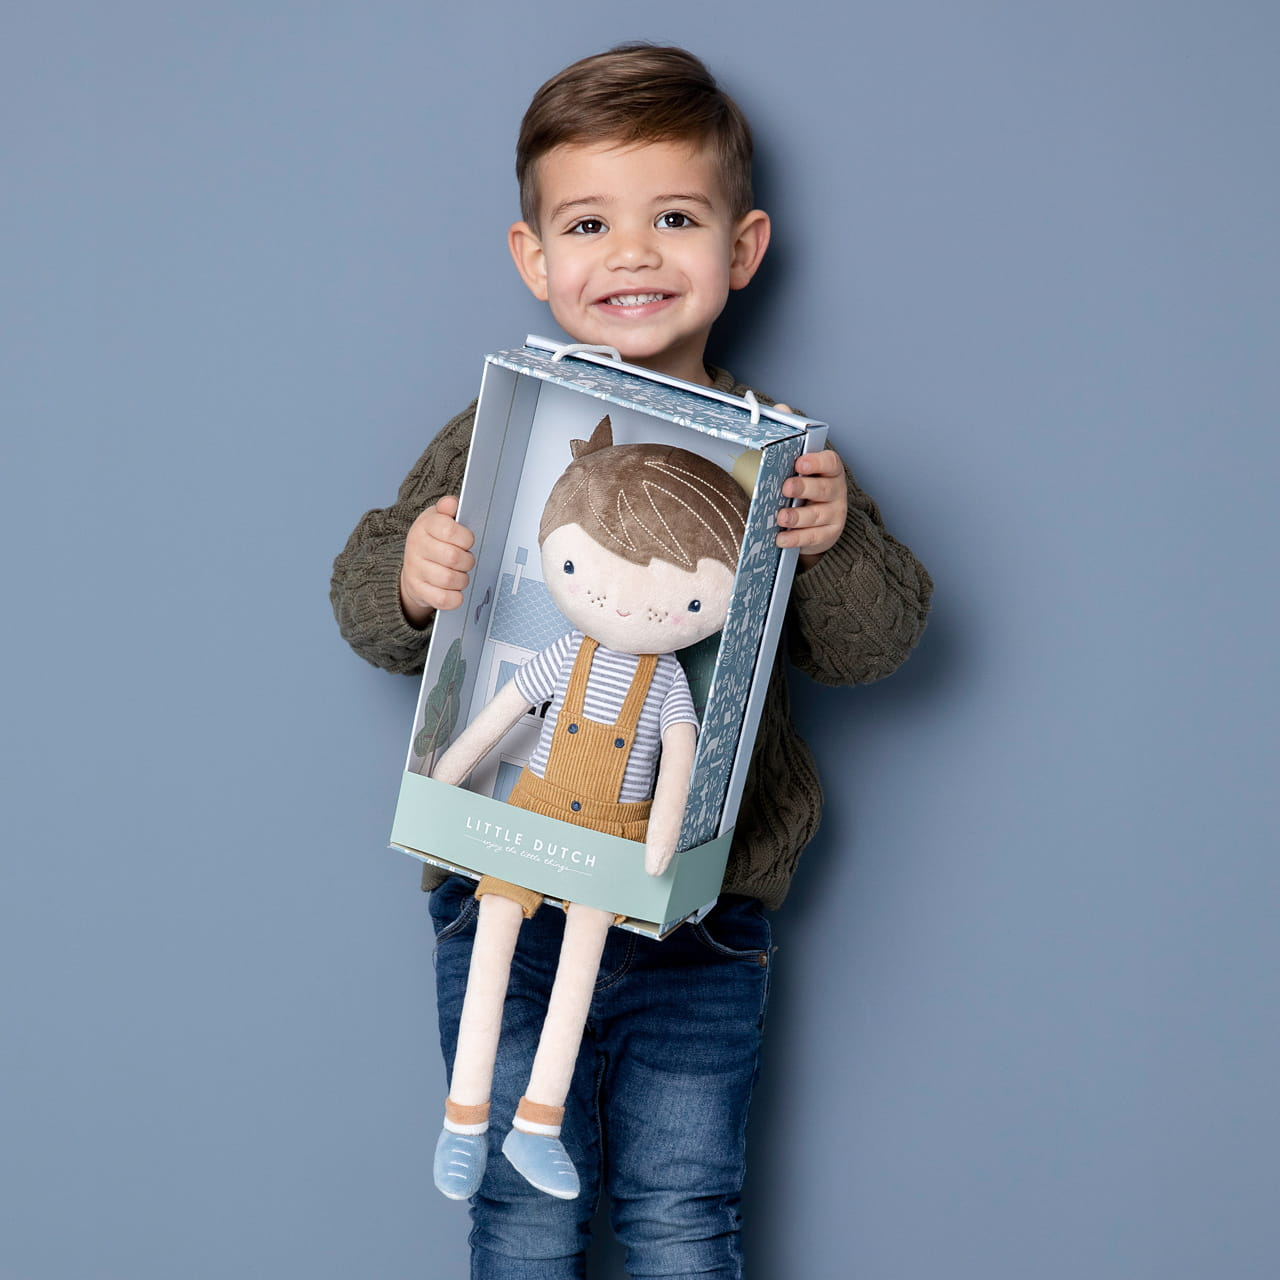 Pluszowa lalka na prezent dla chłopca